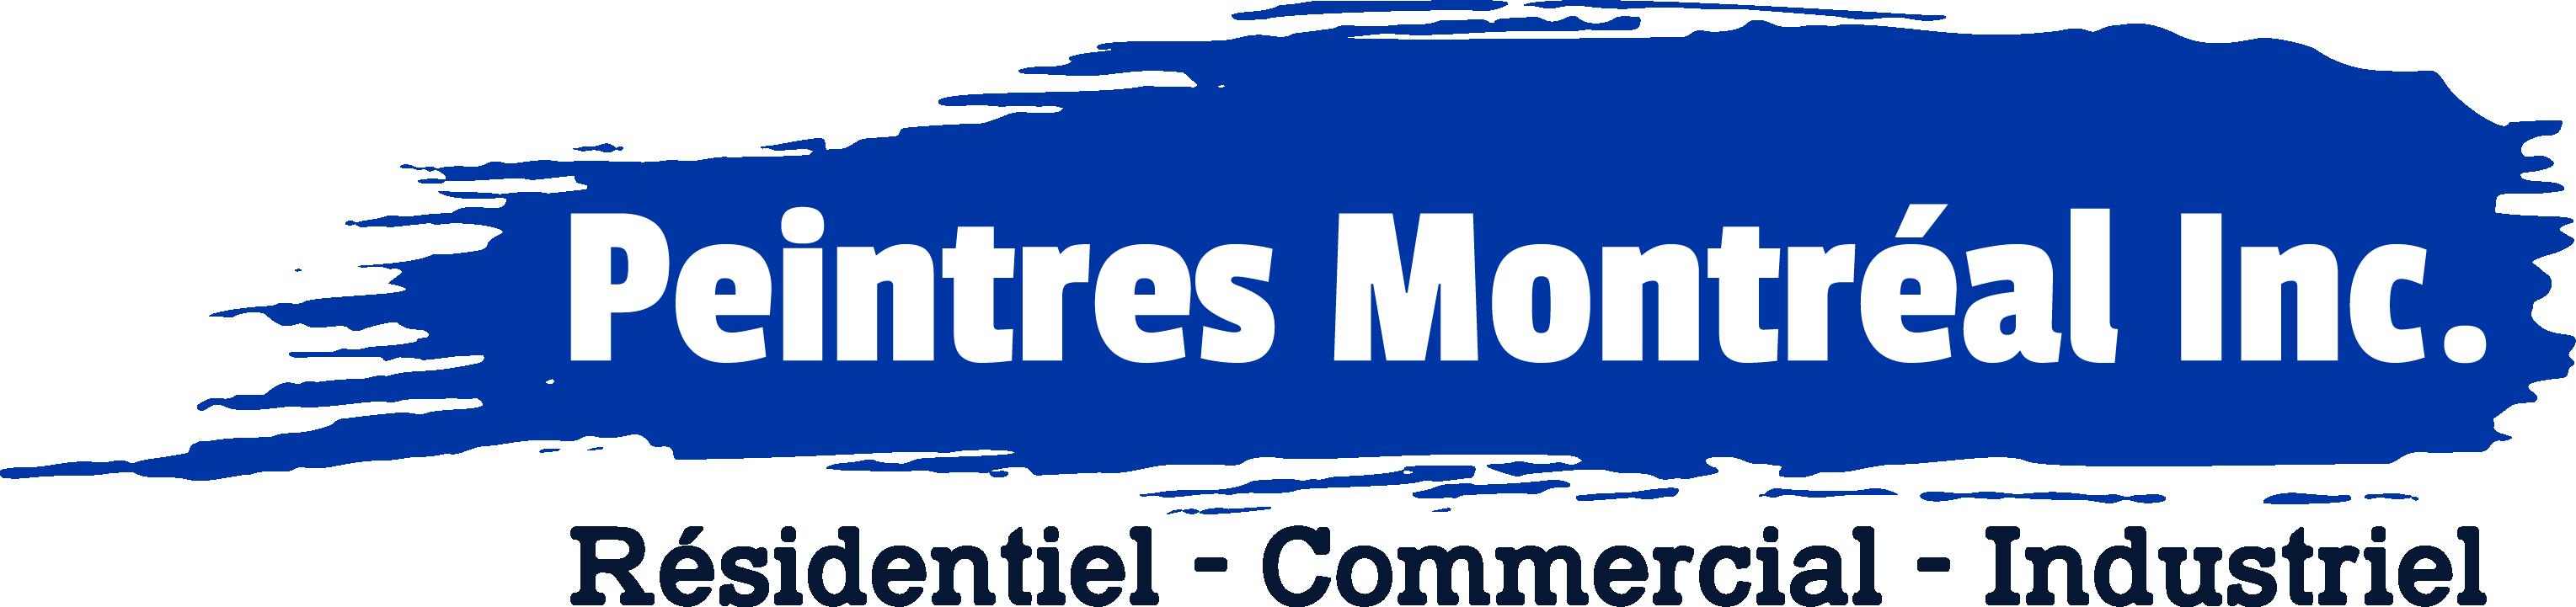 Peintres Montreal Inc.